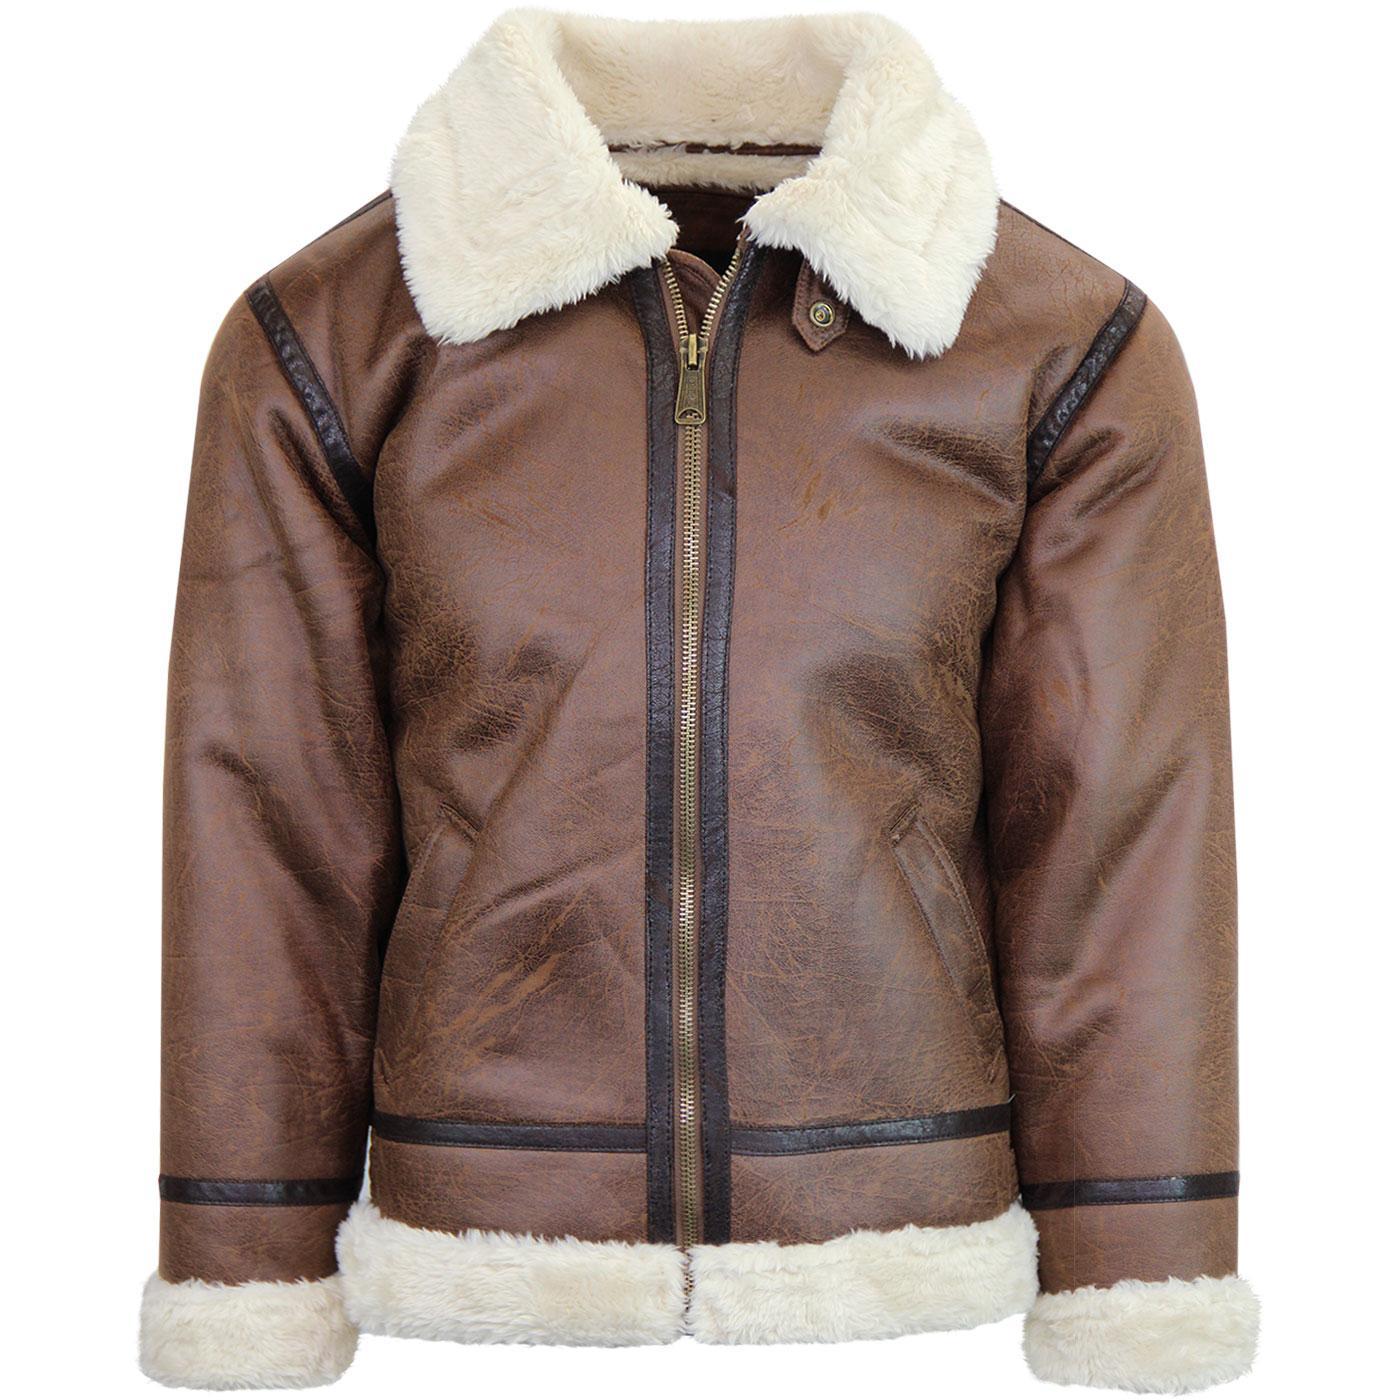 ALPHA INDUSTRIES Faux Leather B3 Flight Jacket Brn